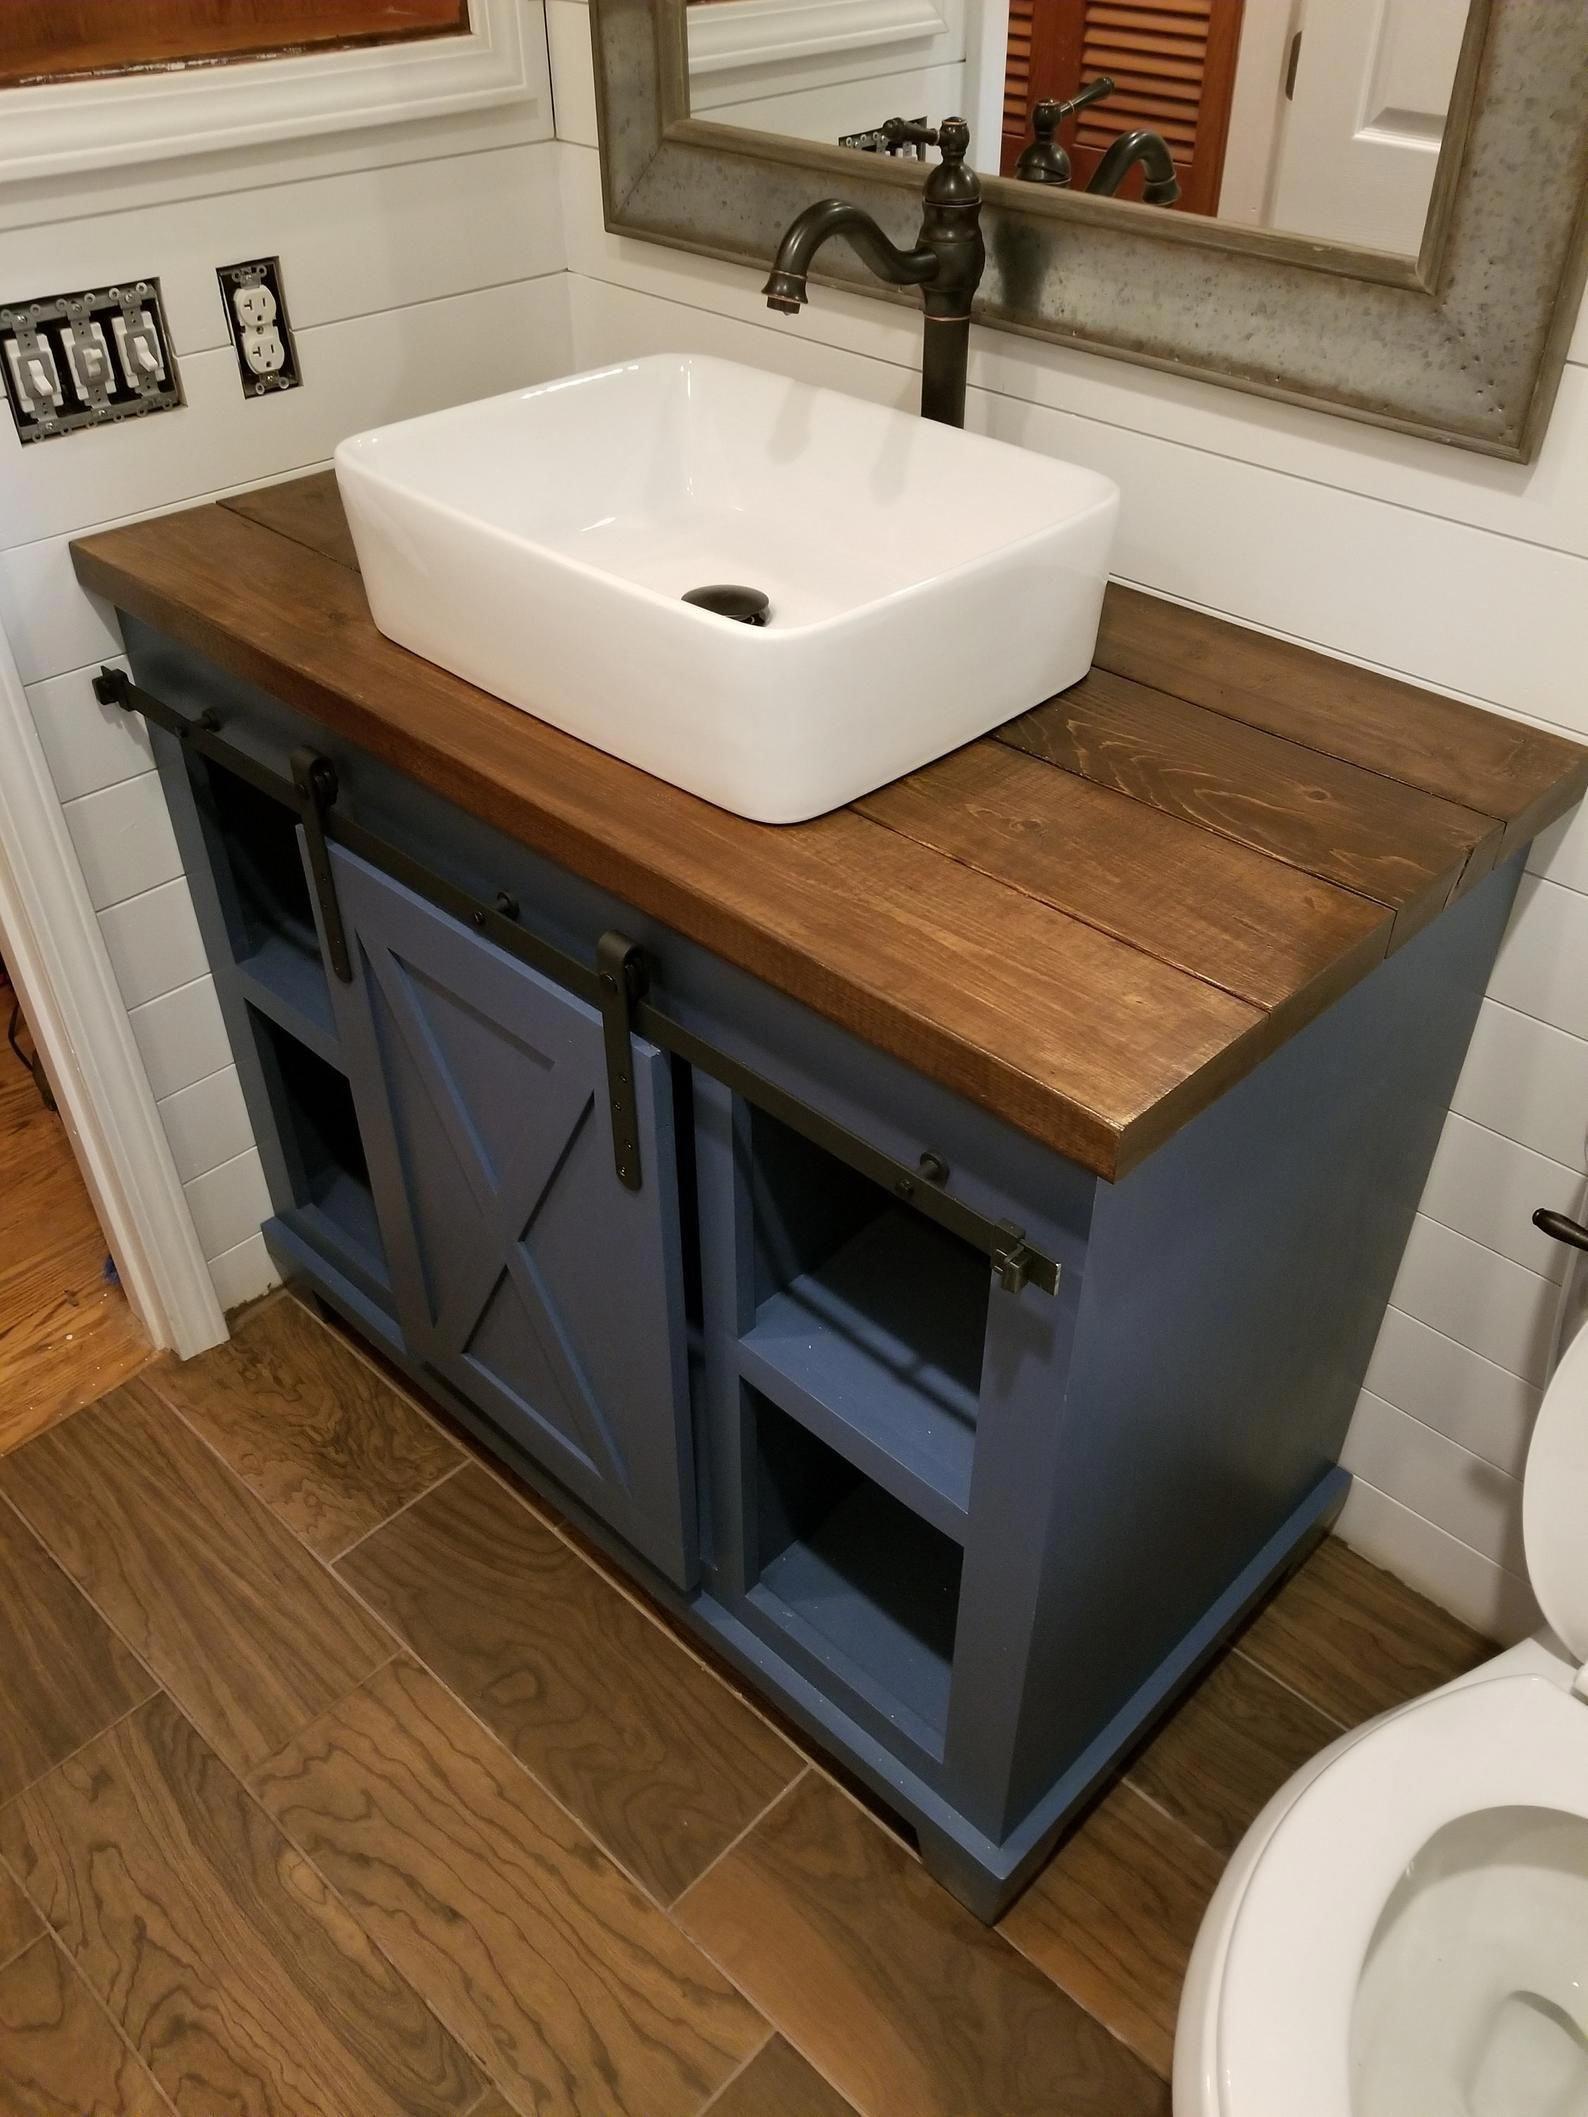 Barn Door Bathroom Vanity Free Shipping Etsy Bathroom Design Small Bathroom Bathroom Interior [ 2117 x 1588 Pixel ]